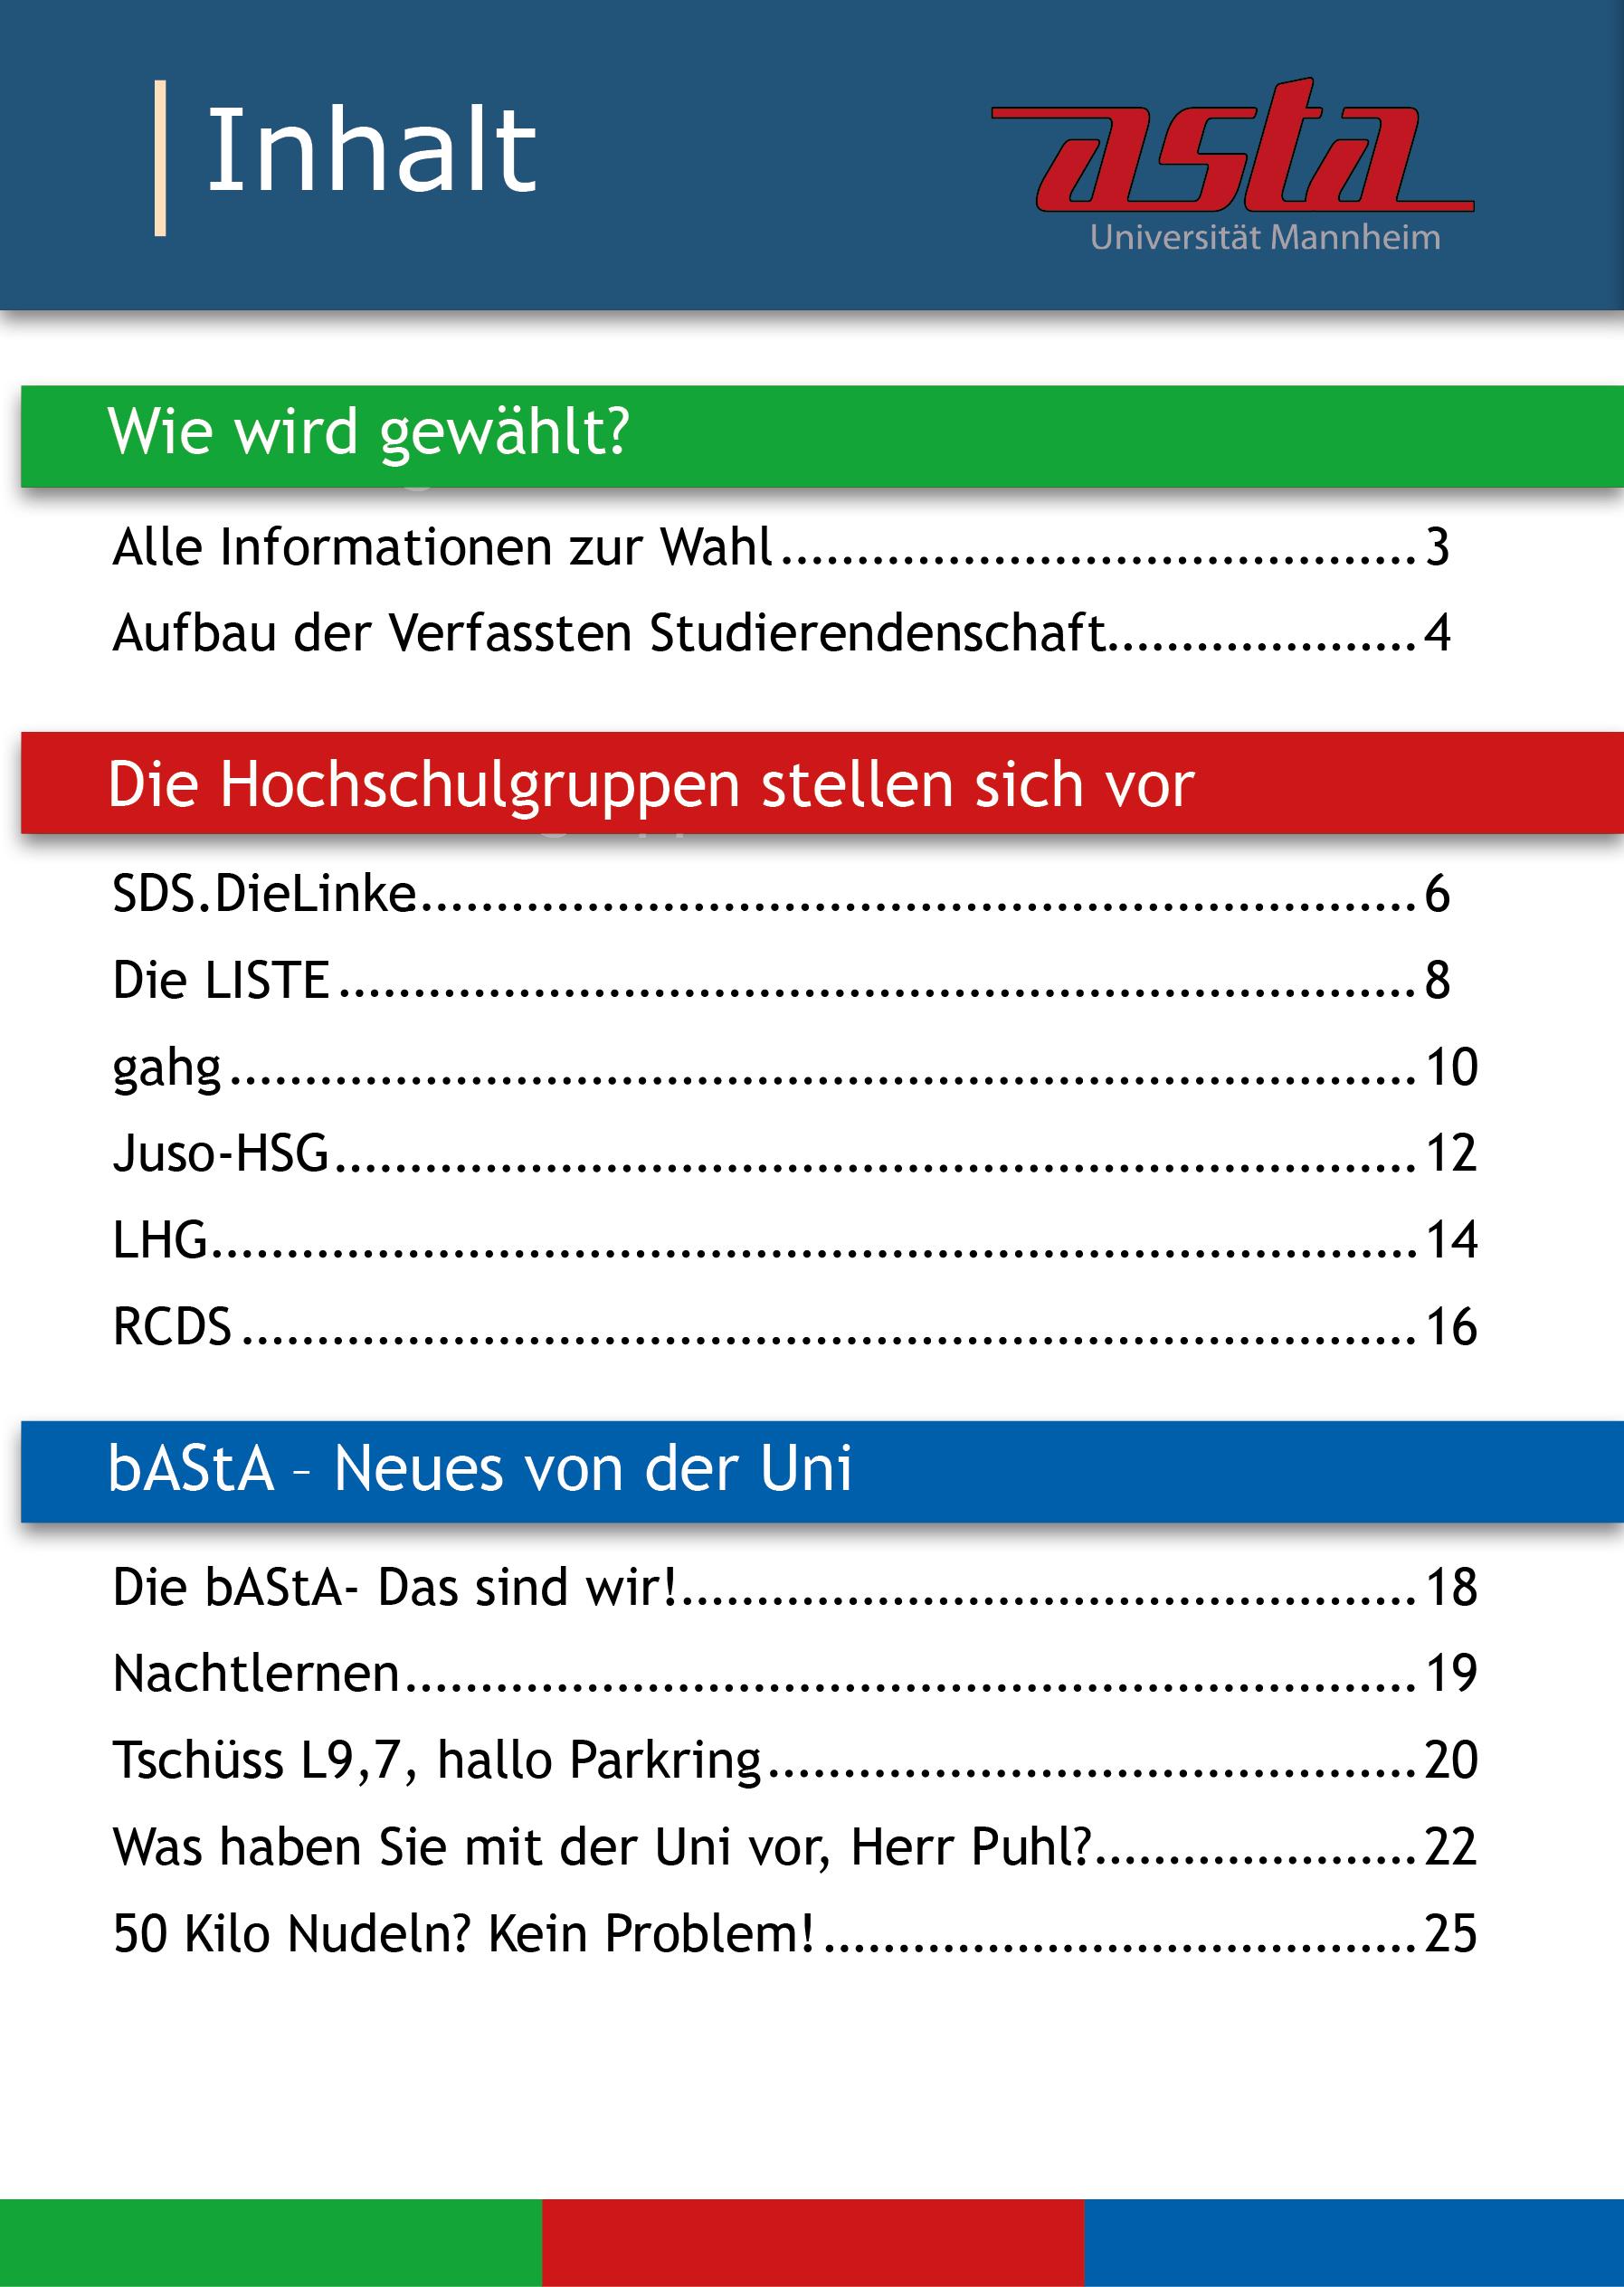 Wahl-bAStA 2018